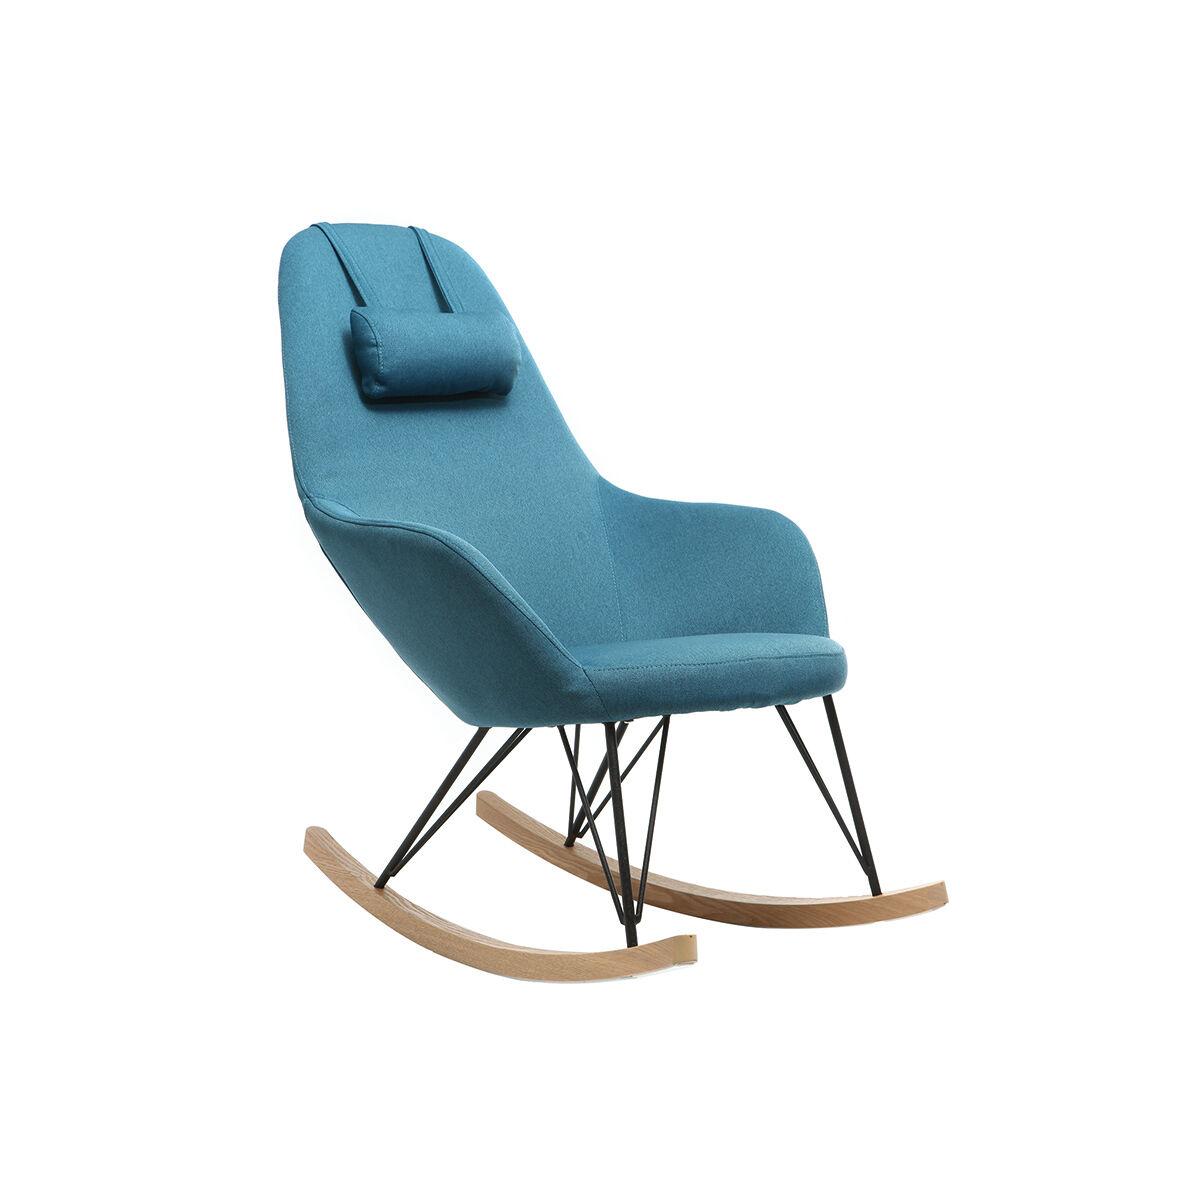 Miliboo Rocking chair en tissu bleu canard avec pieds métal et frêne JHENE